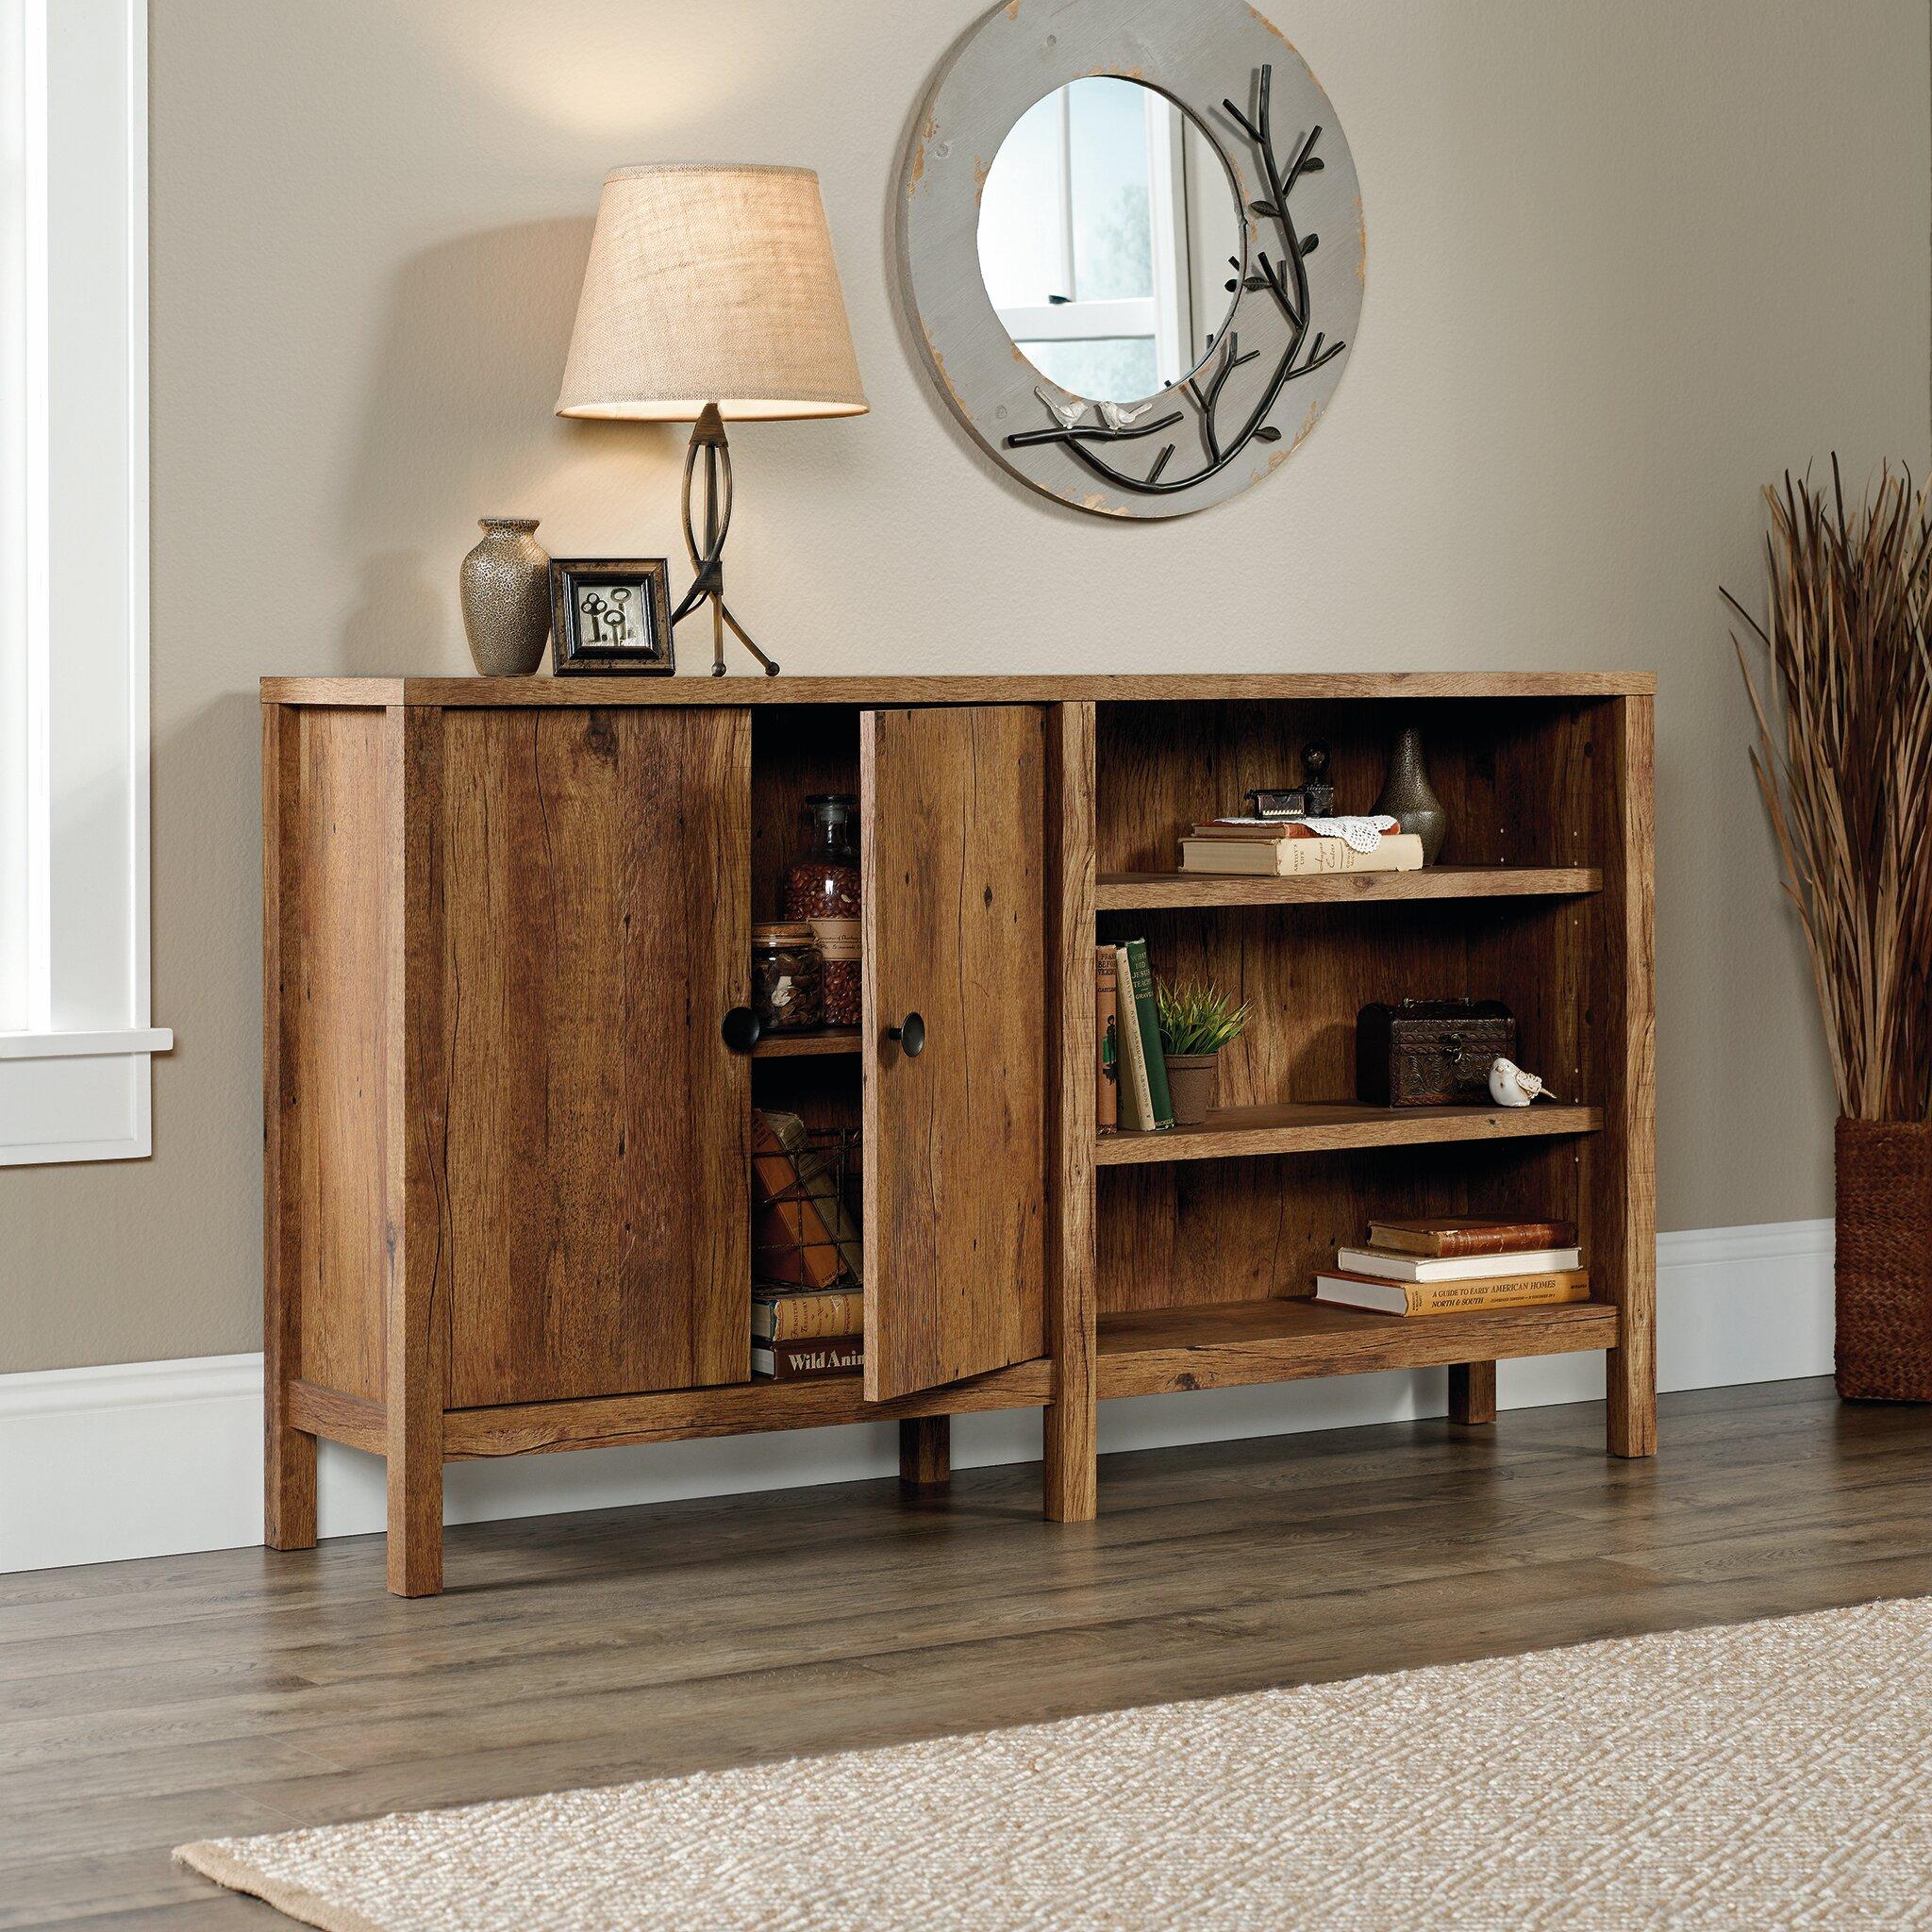 Laurel foundry modern farmhouse odile console table - Laurel foundry modern farmhouse bedroom ...